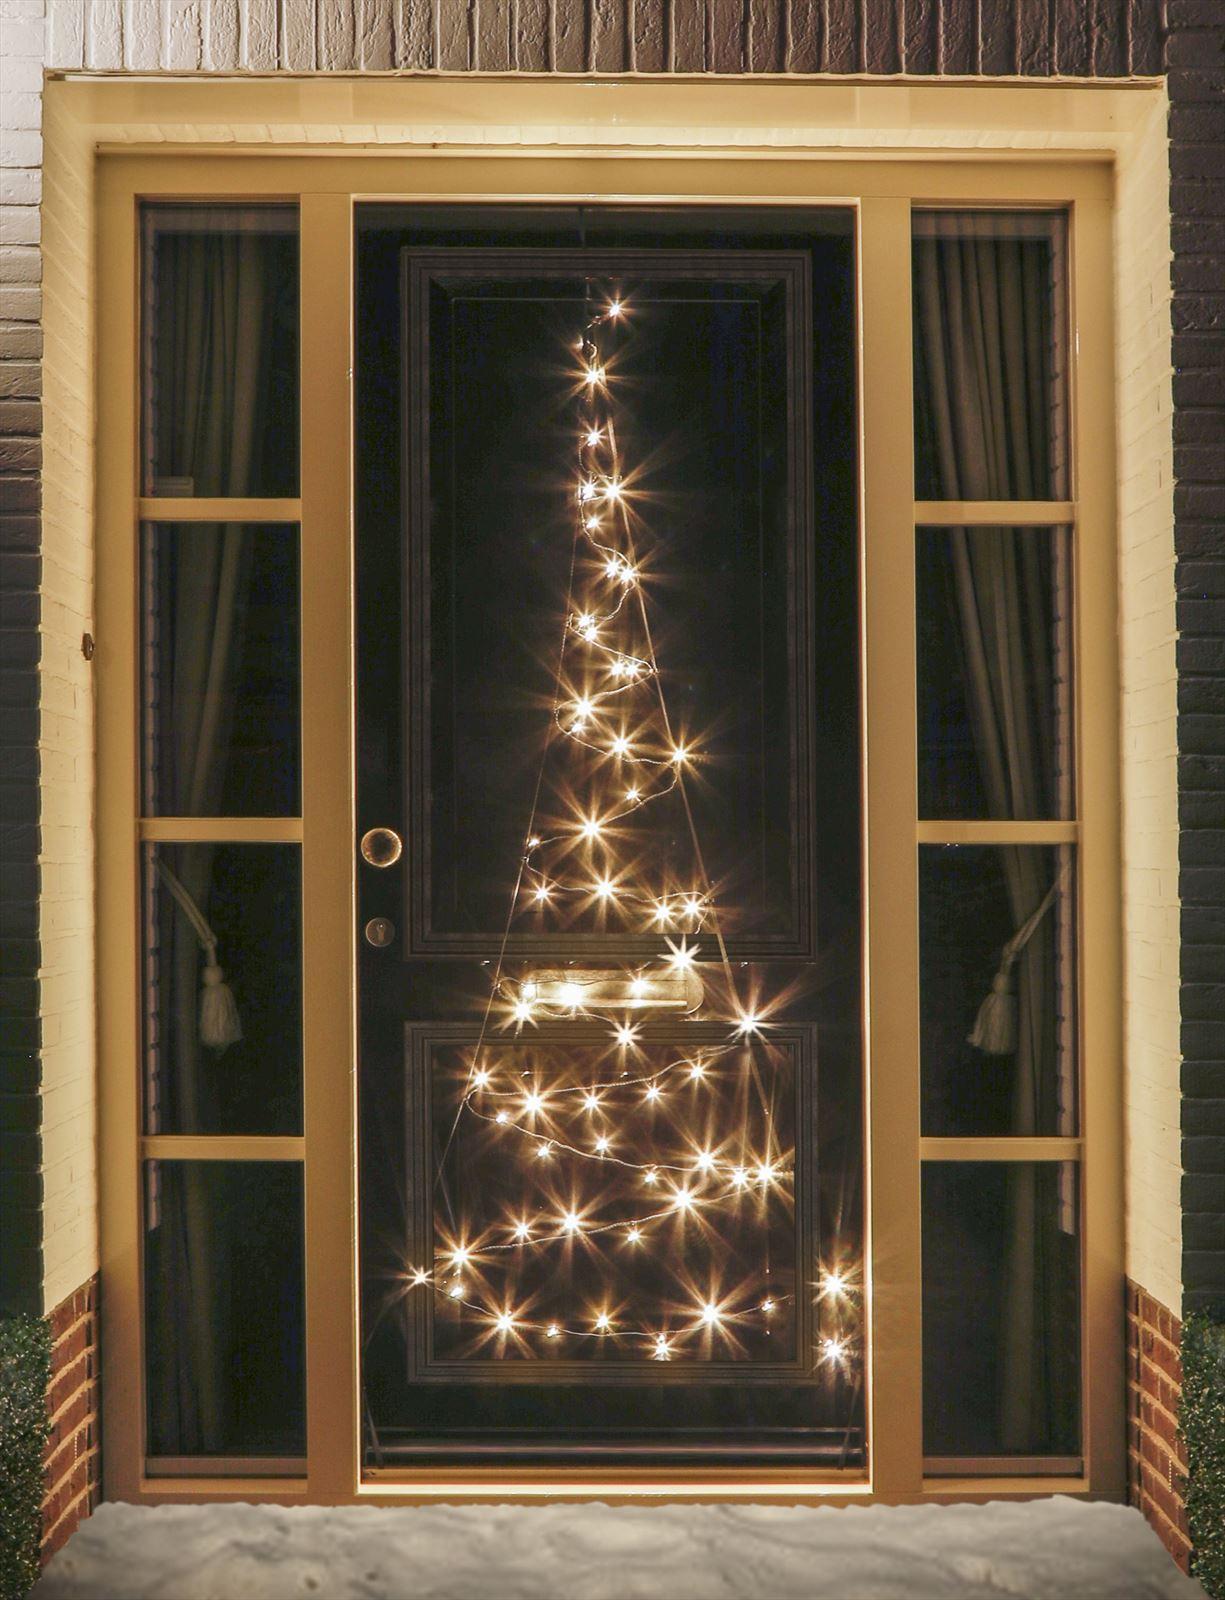 Fairybell kerstbomen Fairybell deurkerstboom, 2,1 meter, 60 LEDs